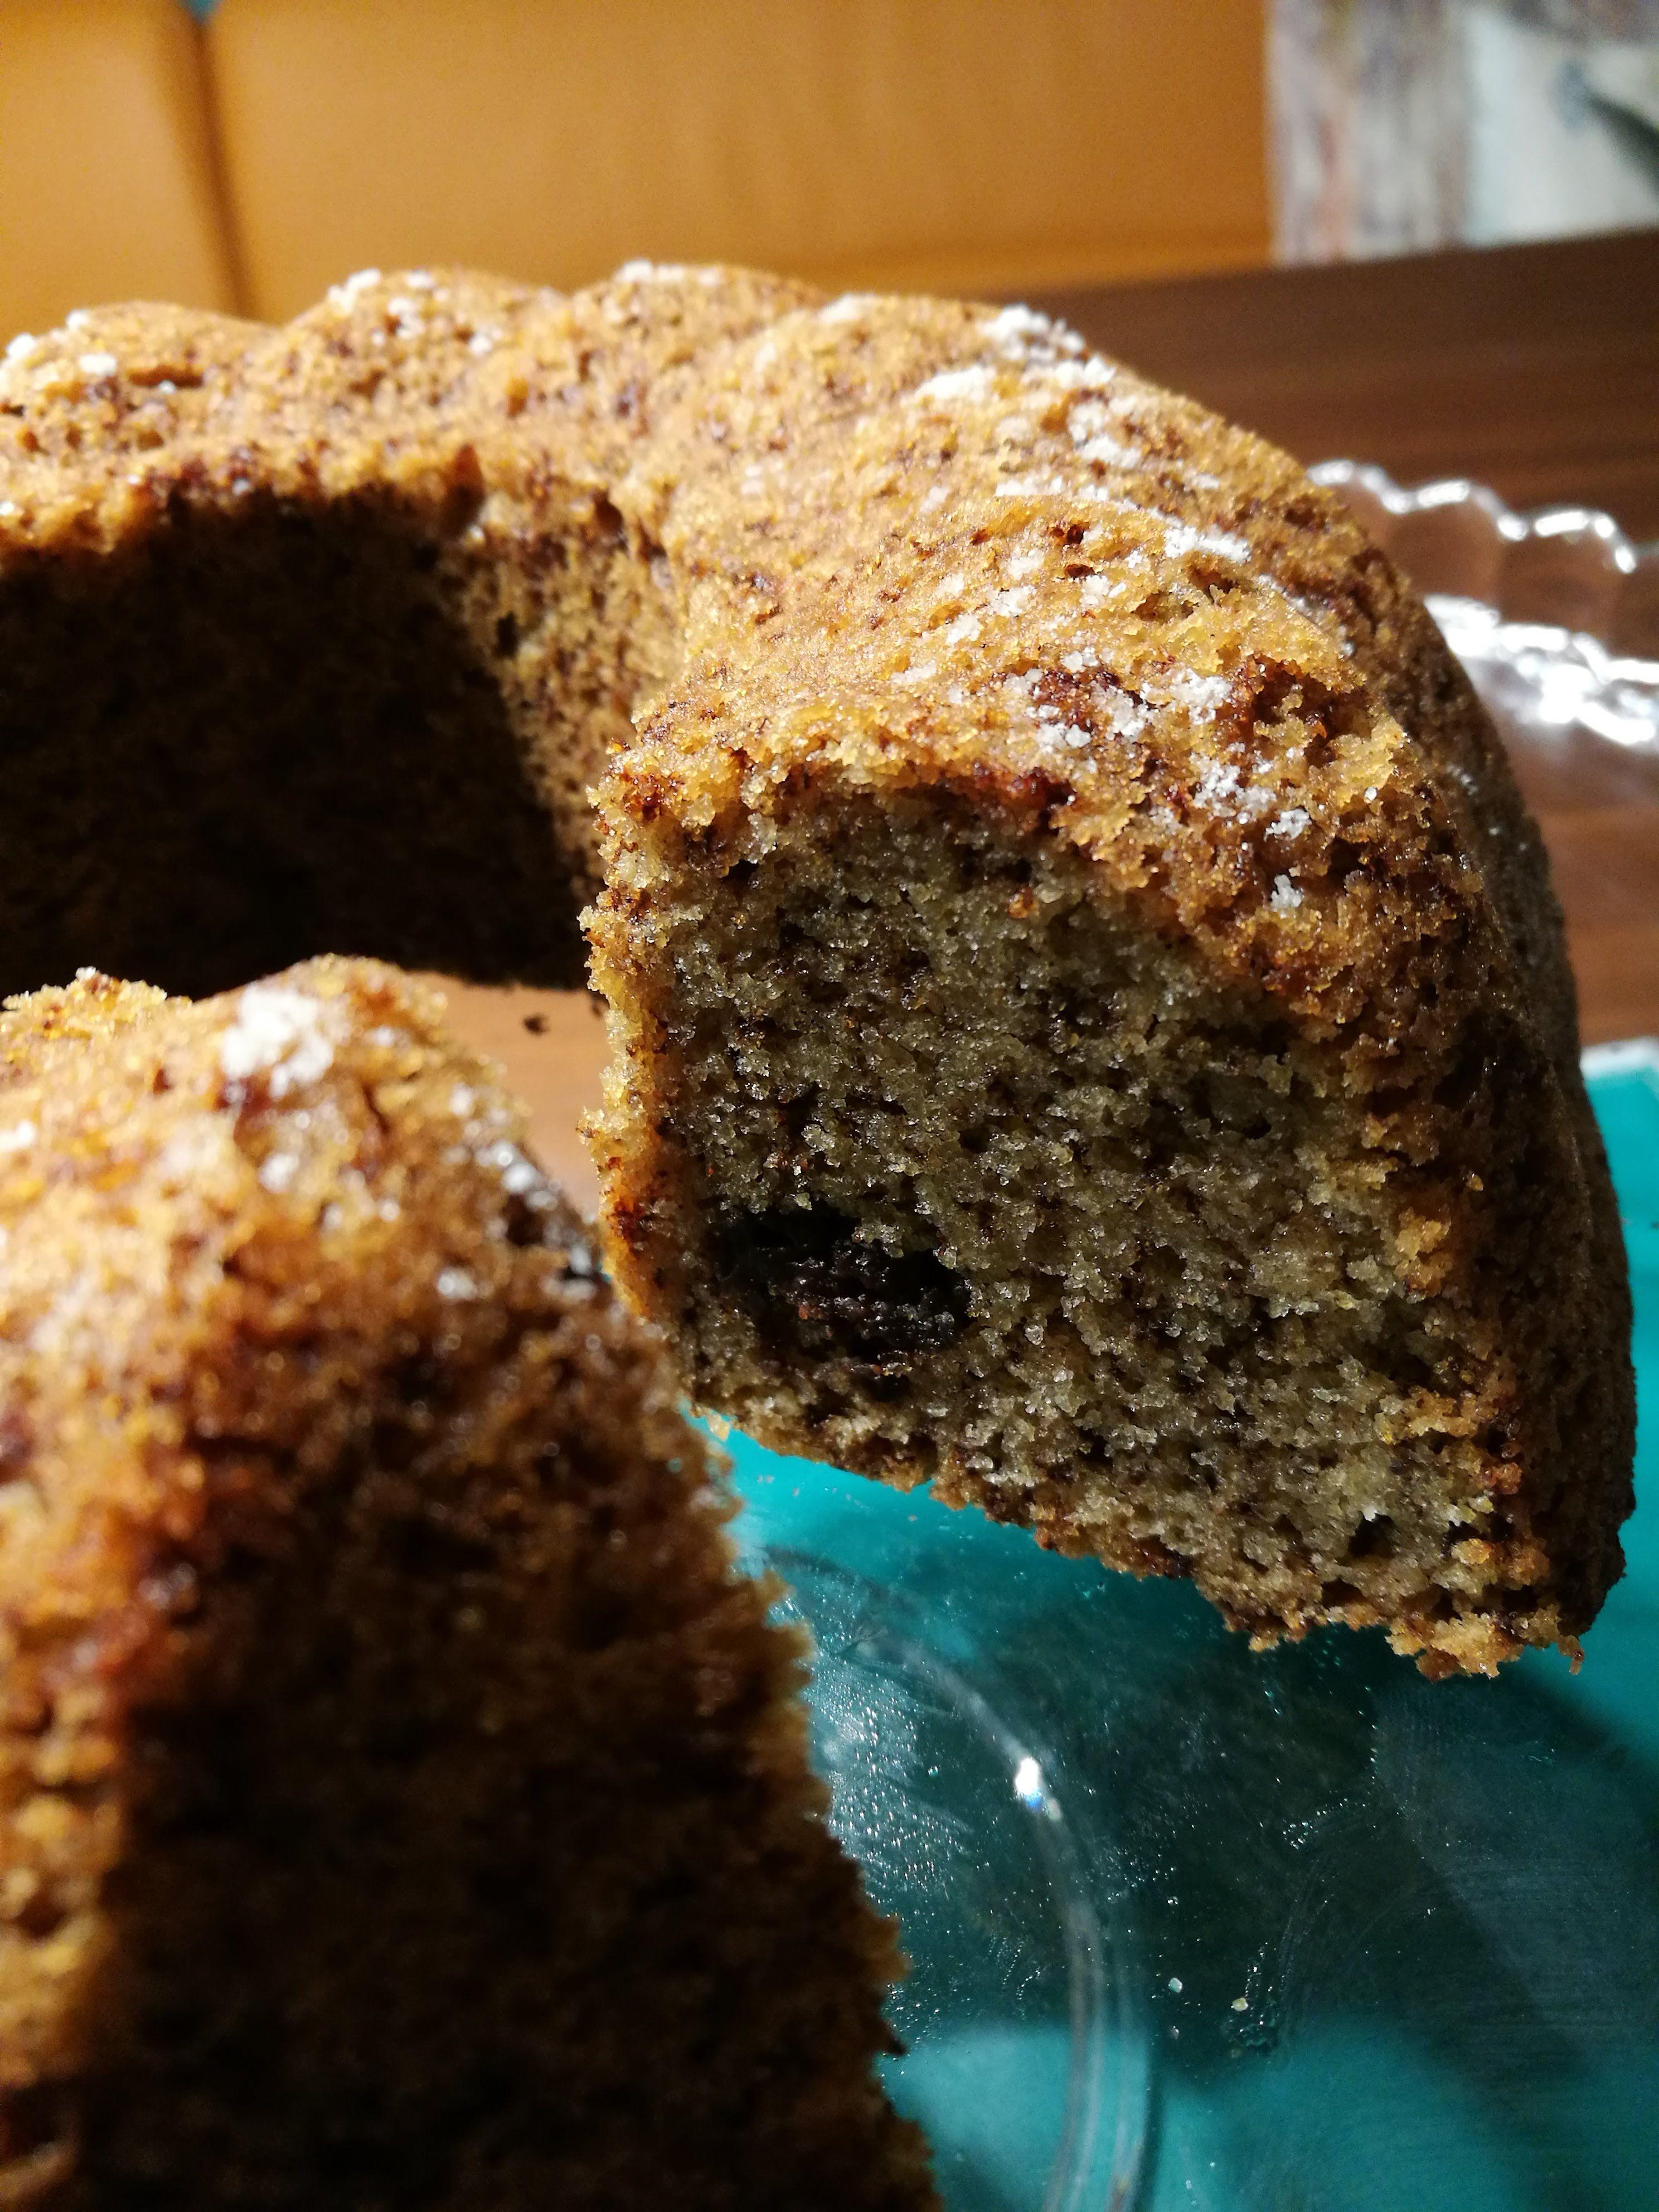 Ameisenkuchen Mandelmehl Xylit Baking Low Carb Low Carb